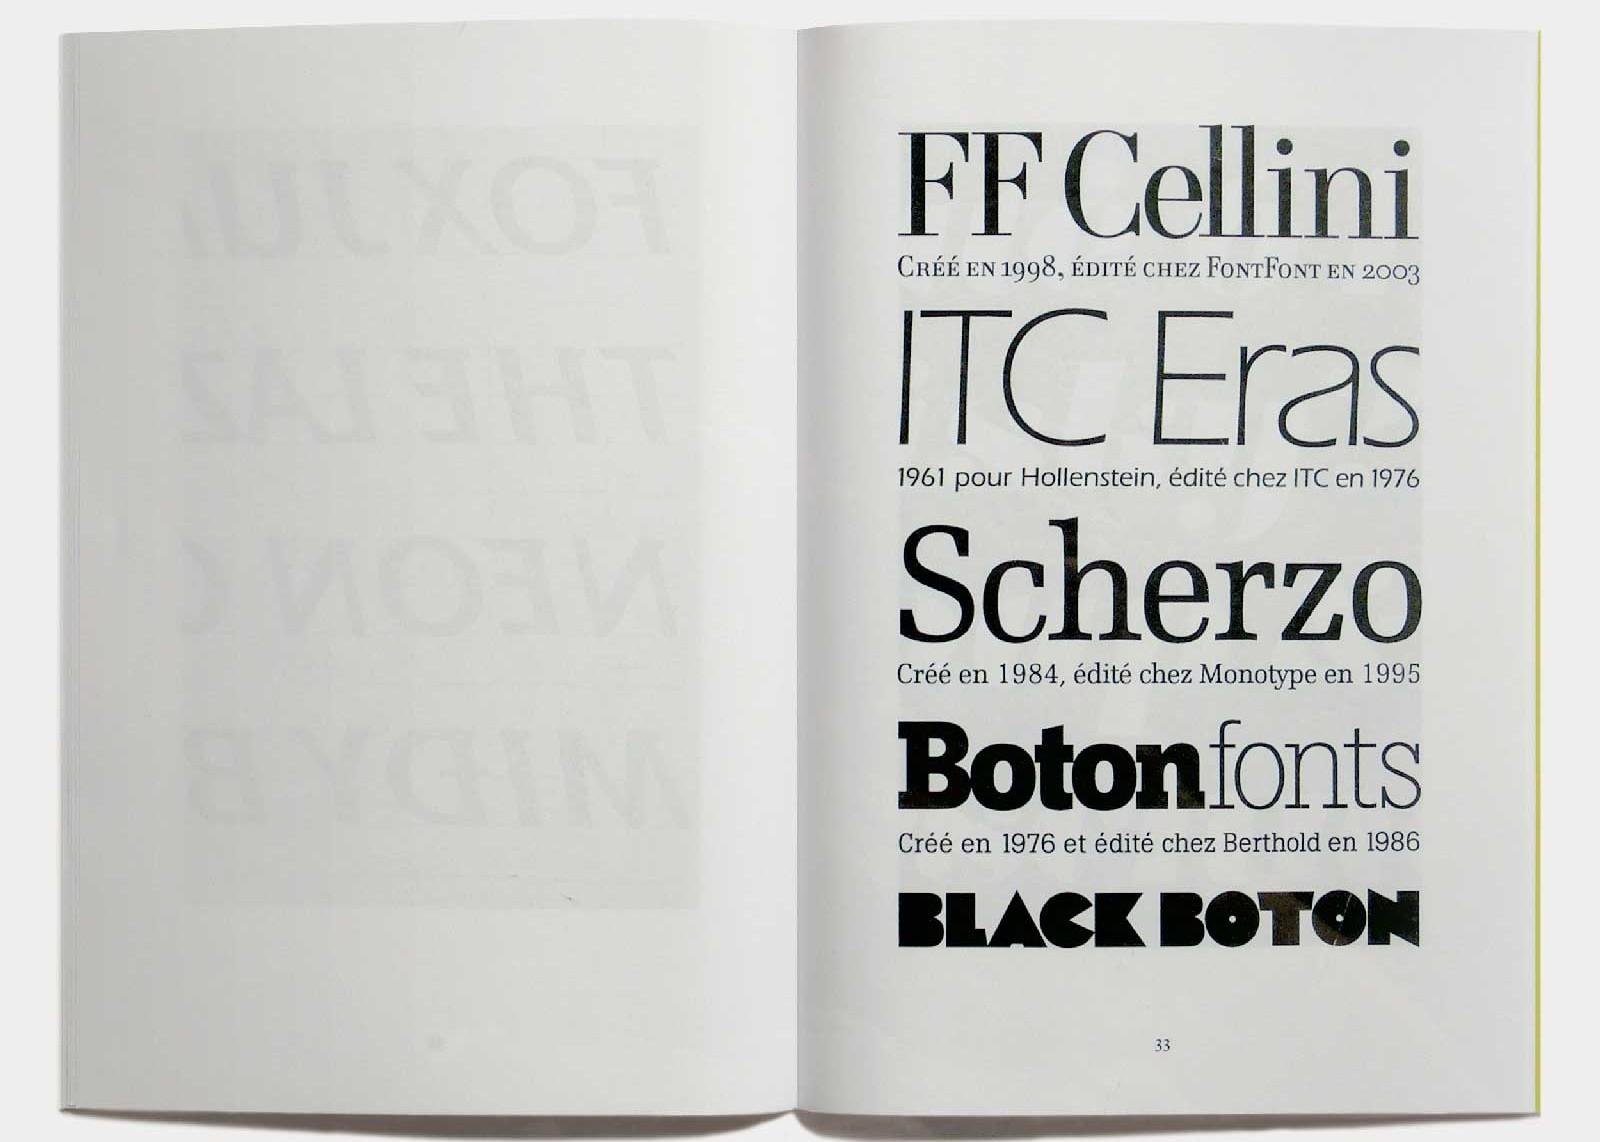 Page 33 — Caractères Cellini (1998; 2003, FontFont), Eras (1961, Hollenstein; 1965, version plomb; 1976, ITC), Scherzo (1984; 1990, Purup; 1995, Monotype), Boton (1976, Typogabor; 1986, Berthold), Black Boton (1970, Delpire; 1997, Monotype).